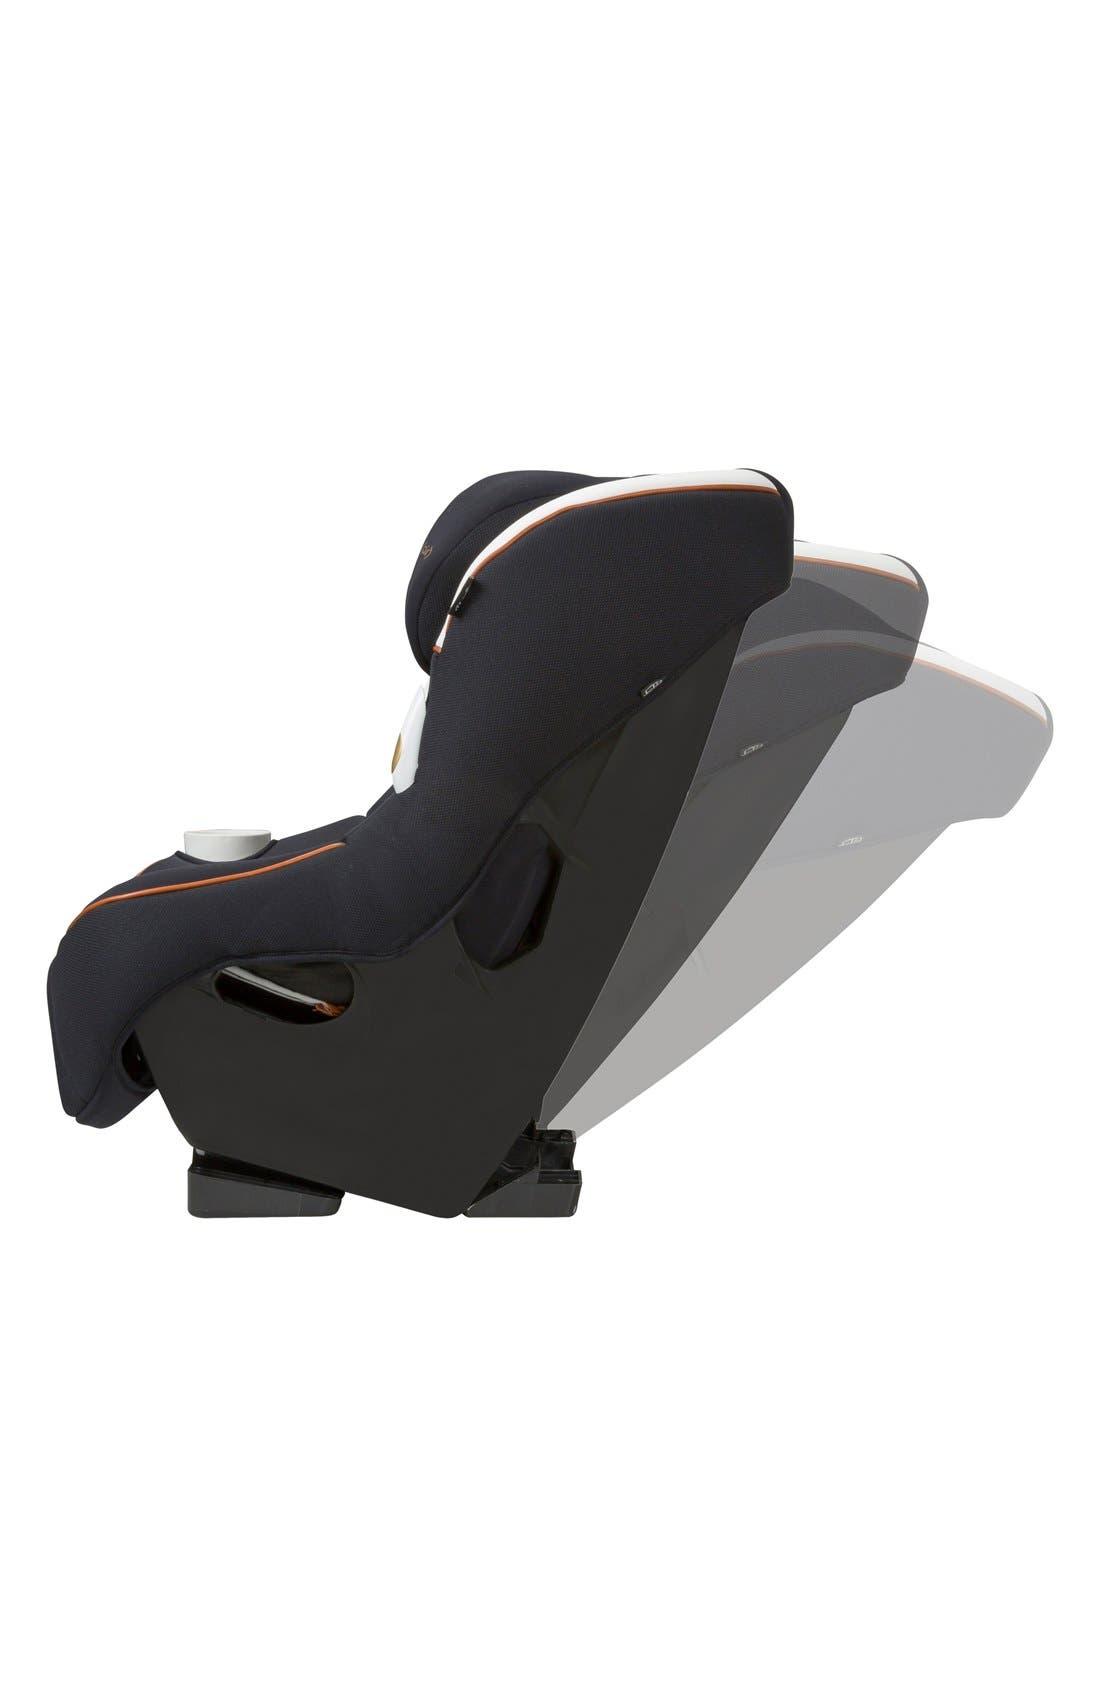 x Rachel Zoe Pria<sup>™</sup> 85 - Special Edition Car Seat,                             Alternate thumbnail 6, color,                             Black/ White